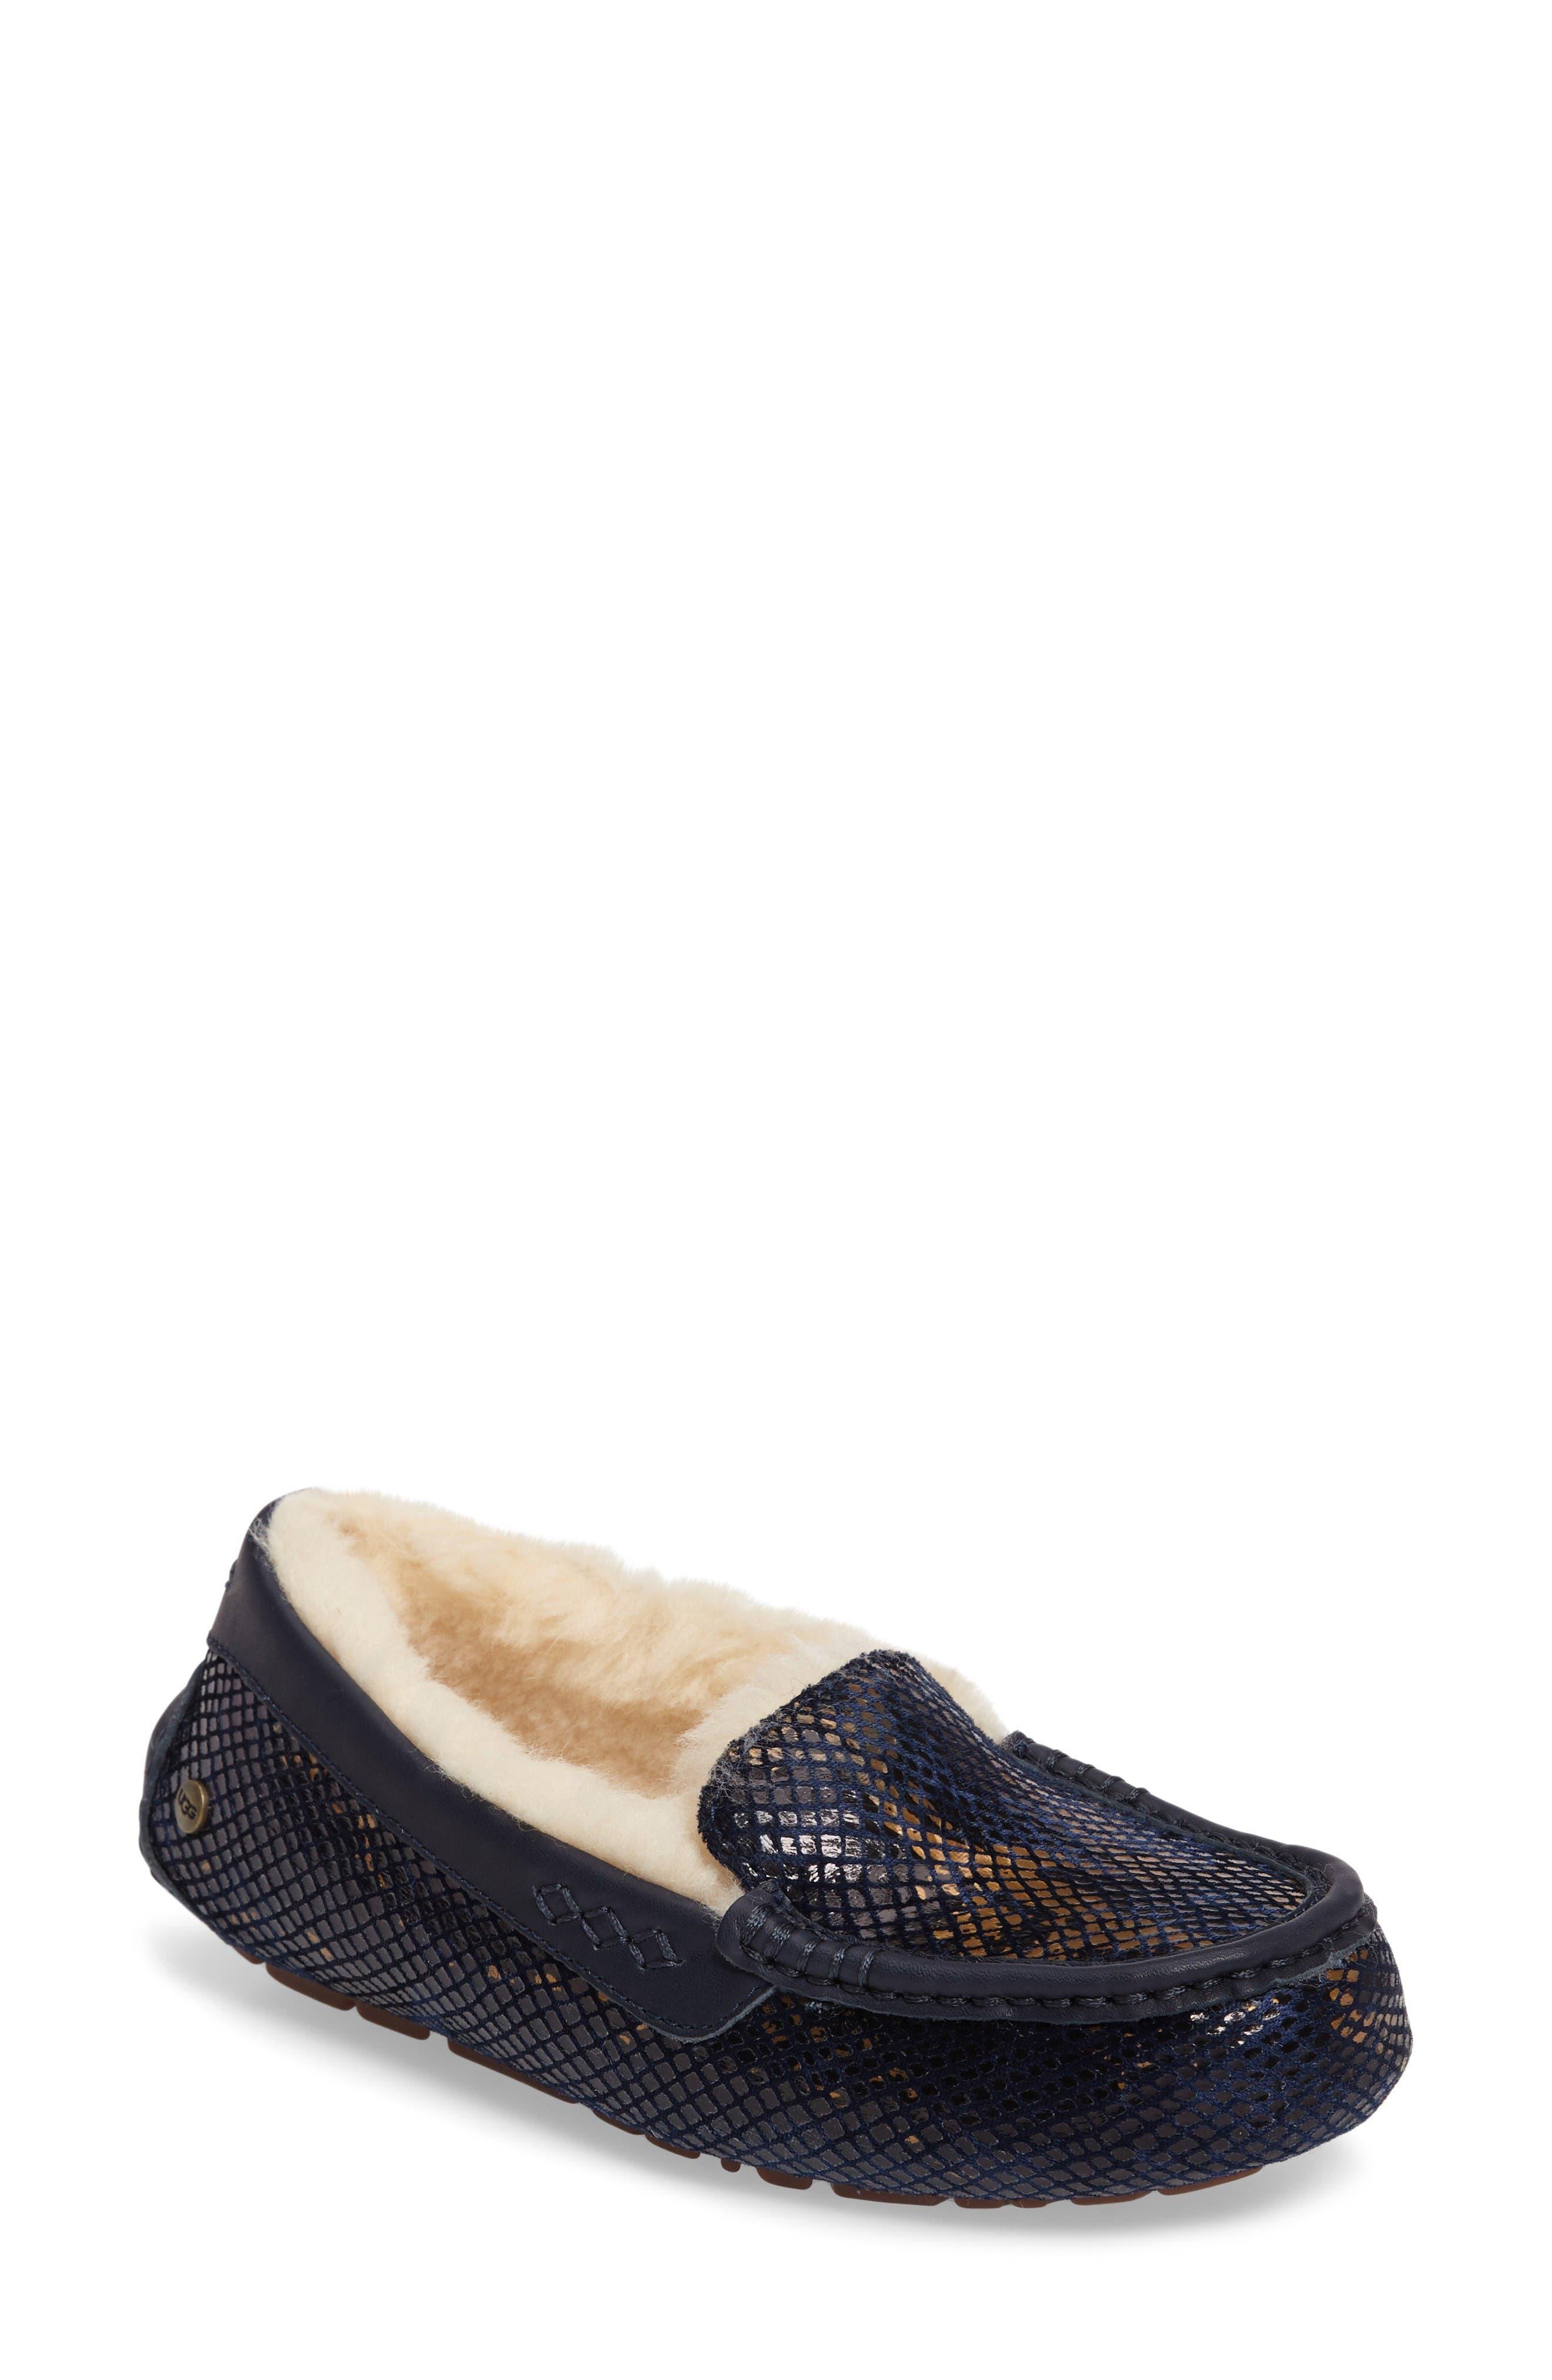 Main Image - UGG® Ansley Exotic Velvet Indoor/Outdoor Slipper (Women)